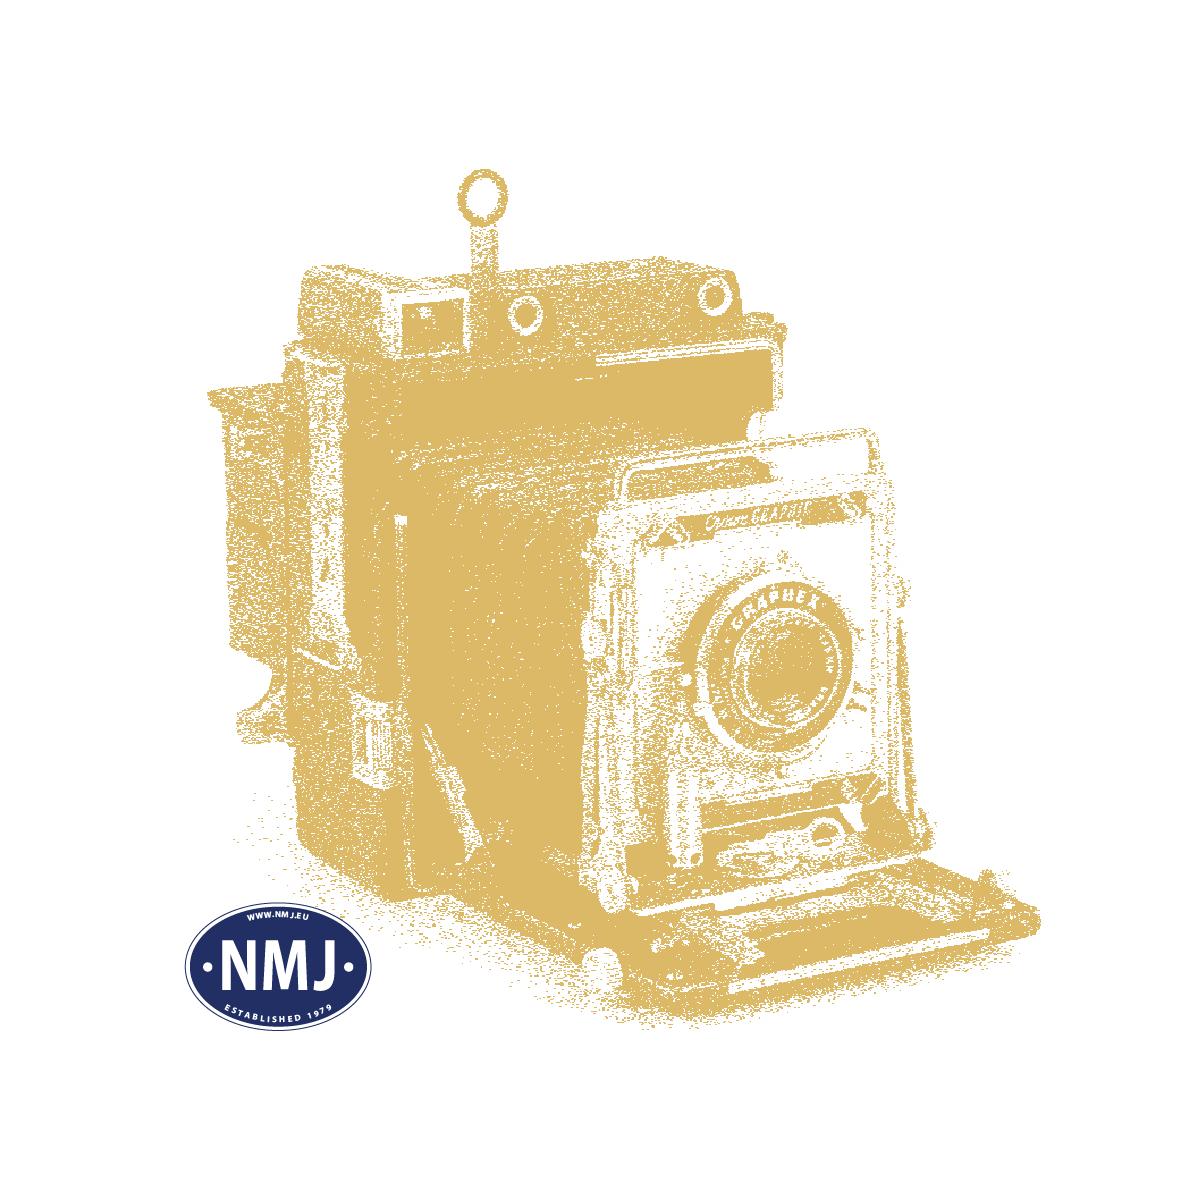 NMJT501.106 - NMJ Topline Modell des Rungenwagens Os 21 76 370 0 047-2 der NSB